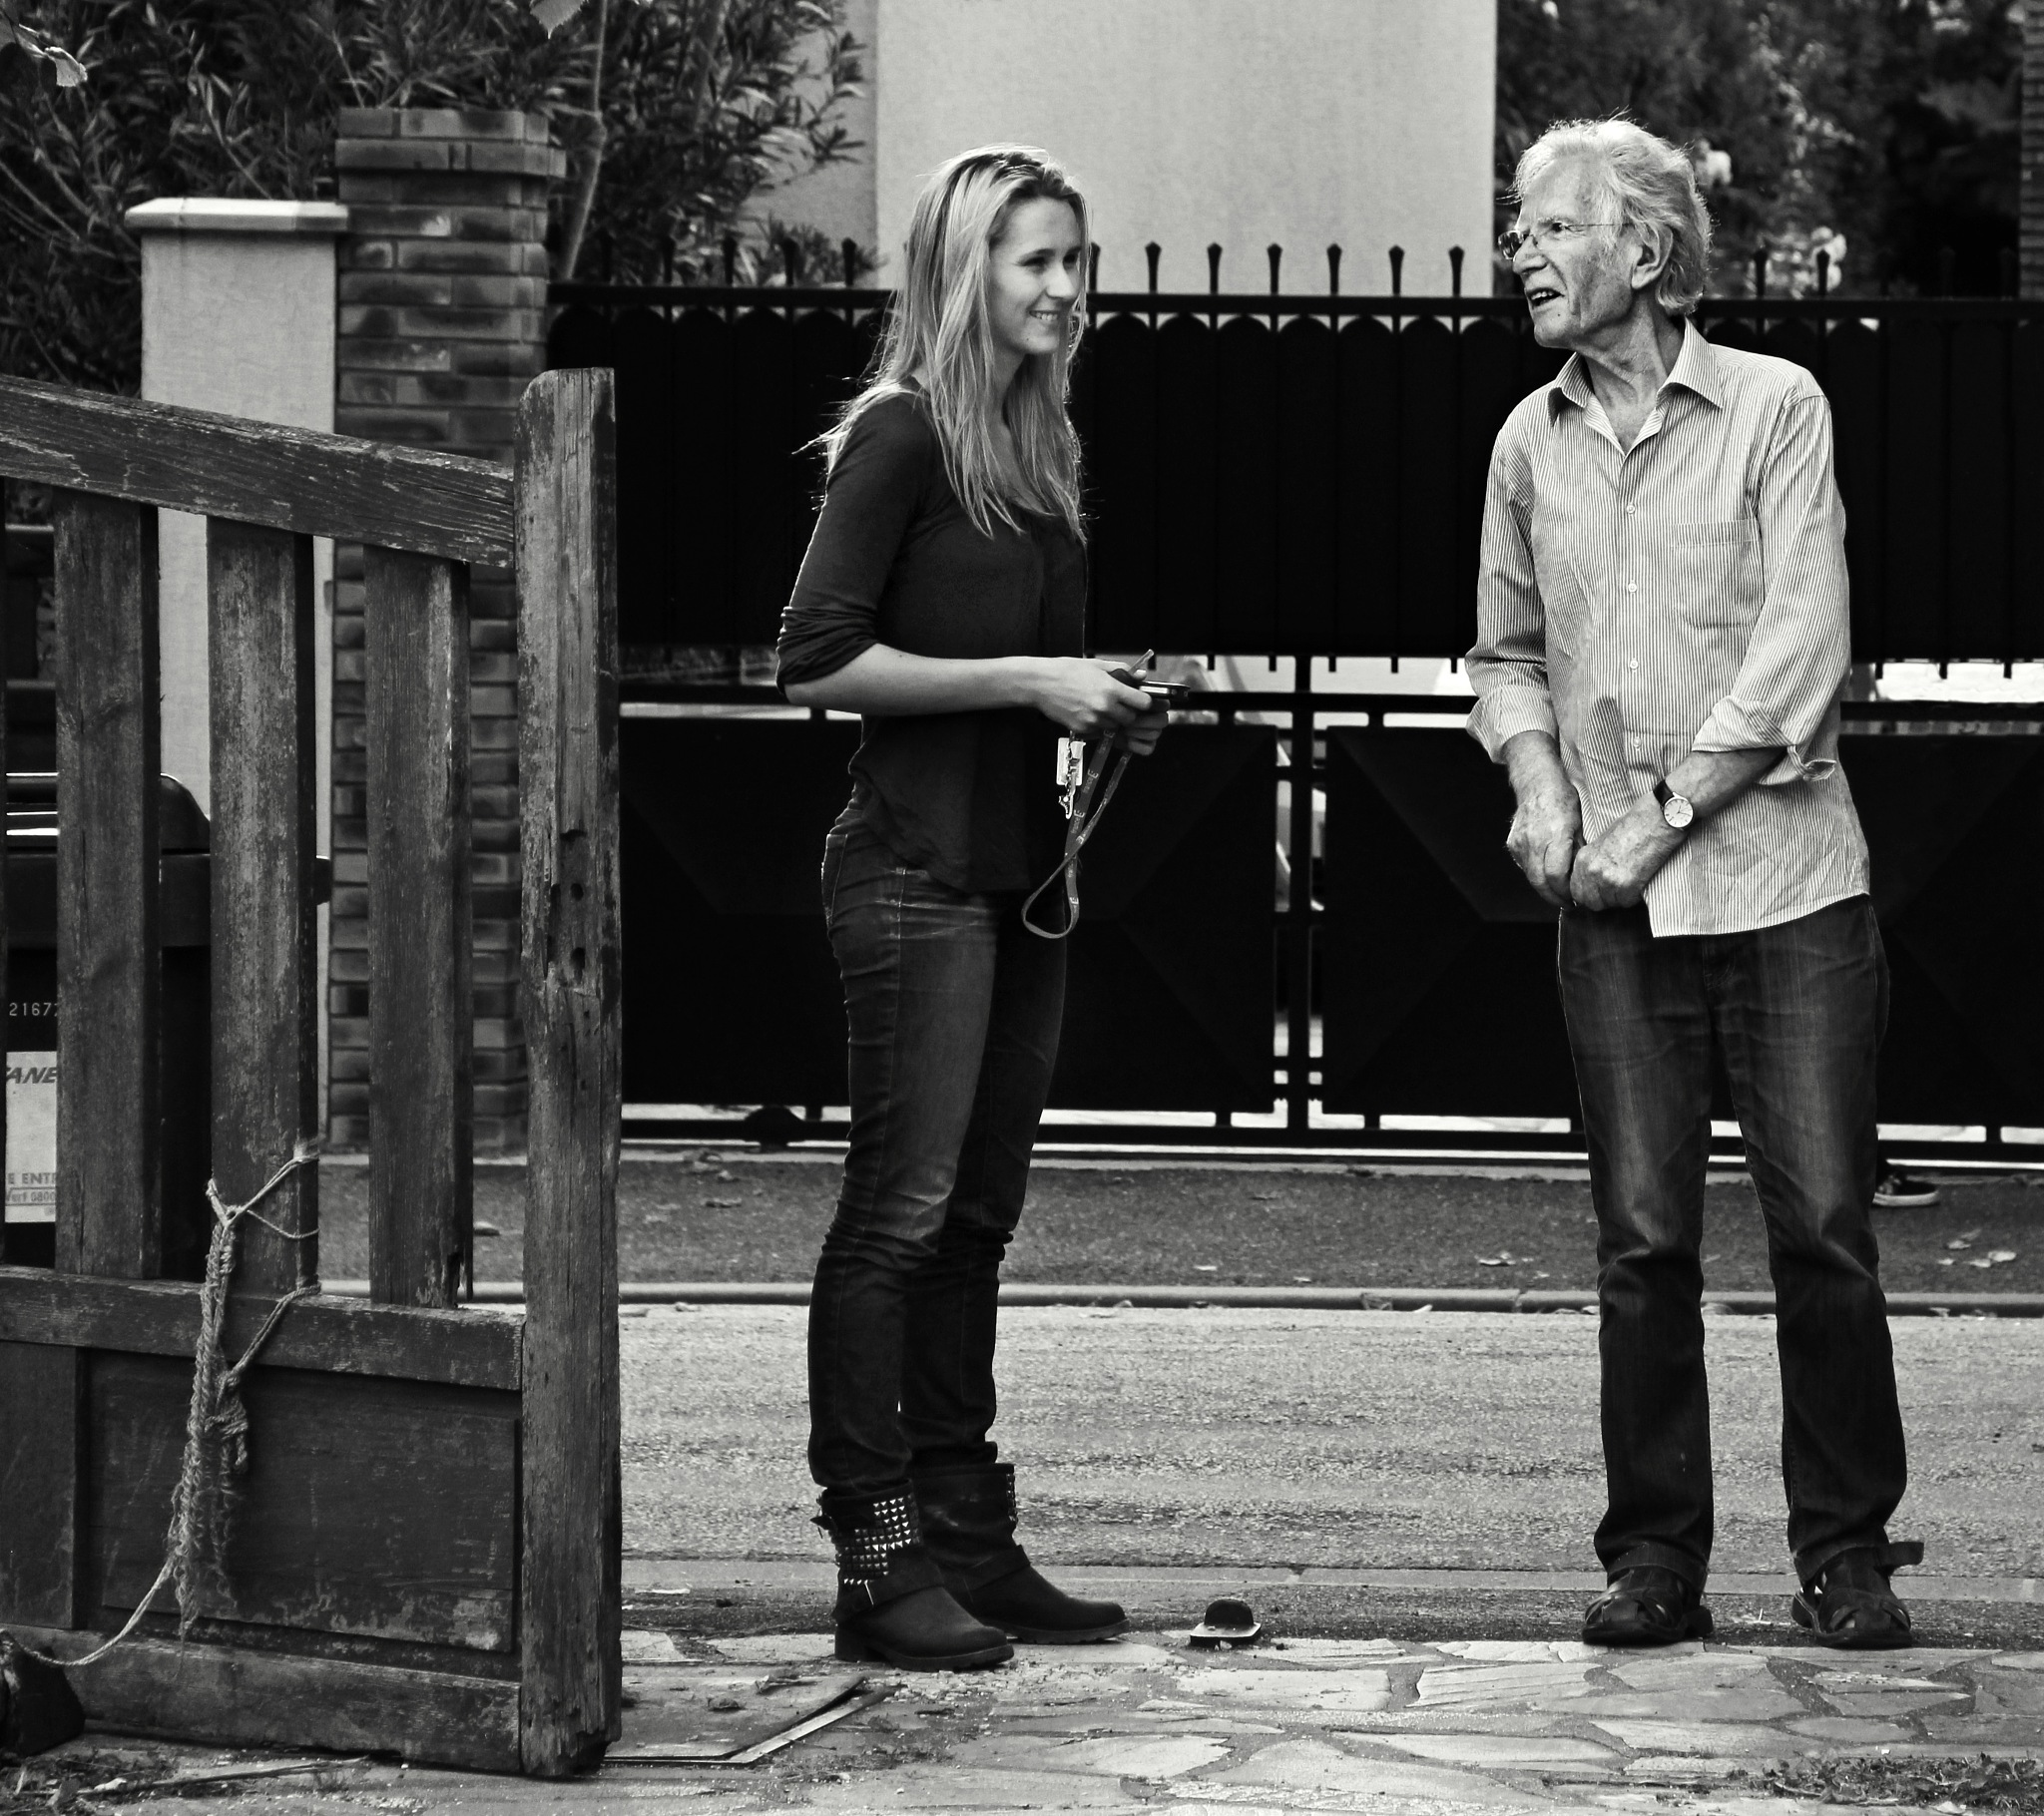 Serge and blonde by Сергей Юрьев